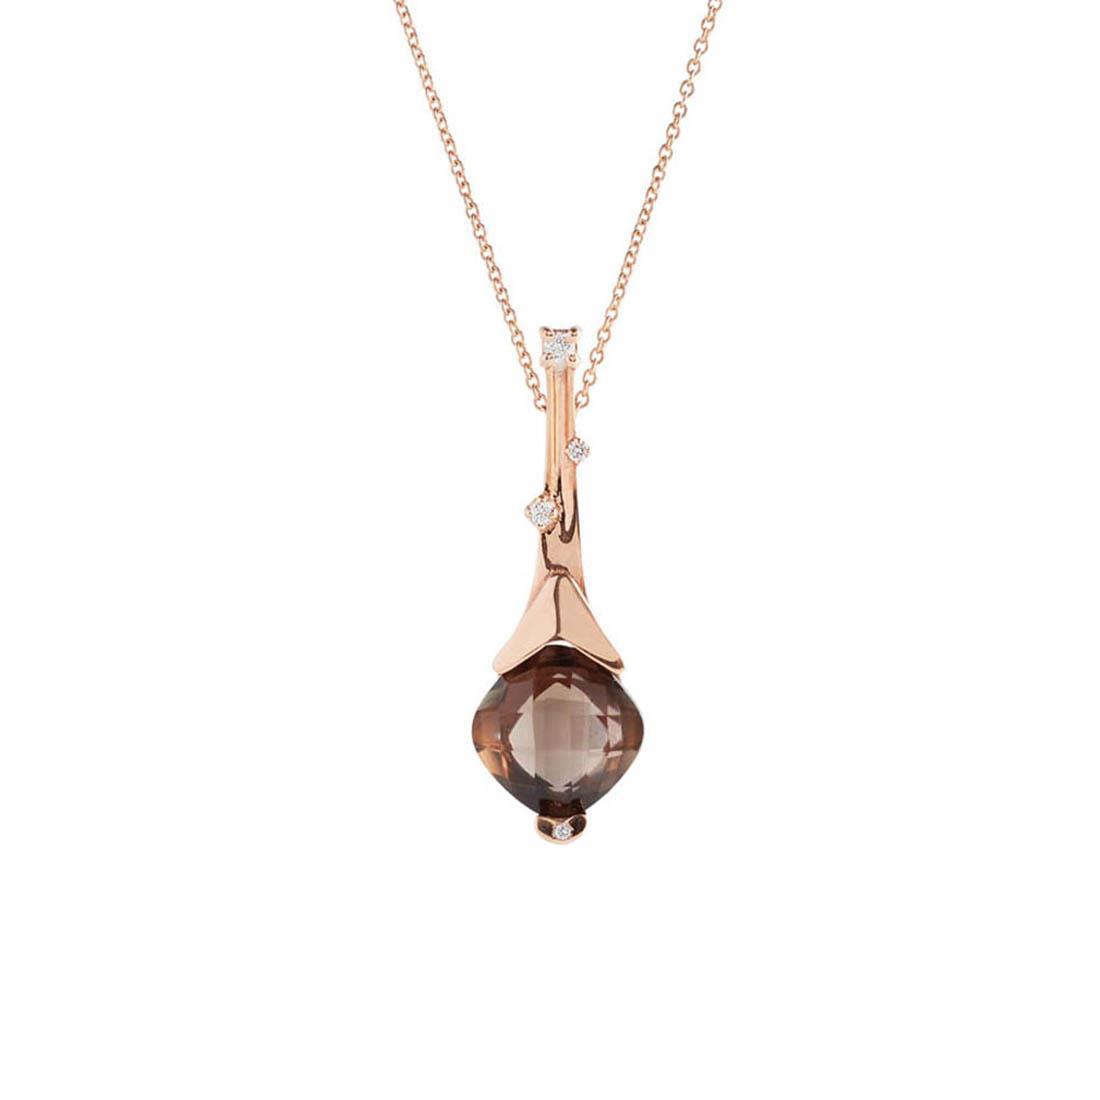 Necklace with smoky quartz and diamonds - ALFIERI & ST. JOHN